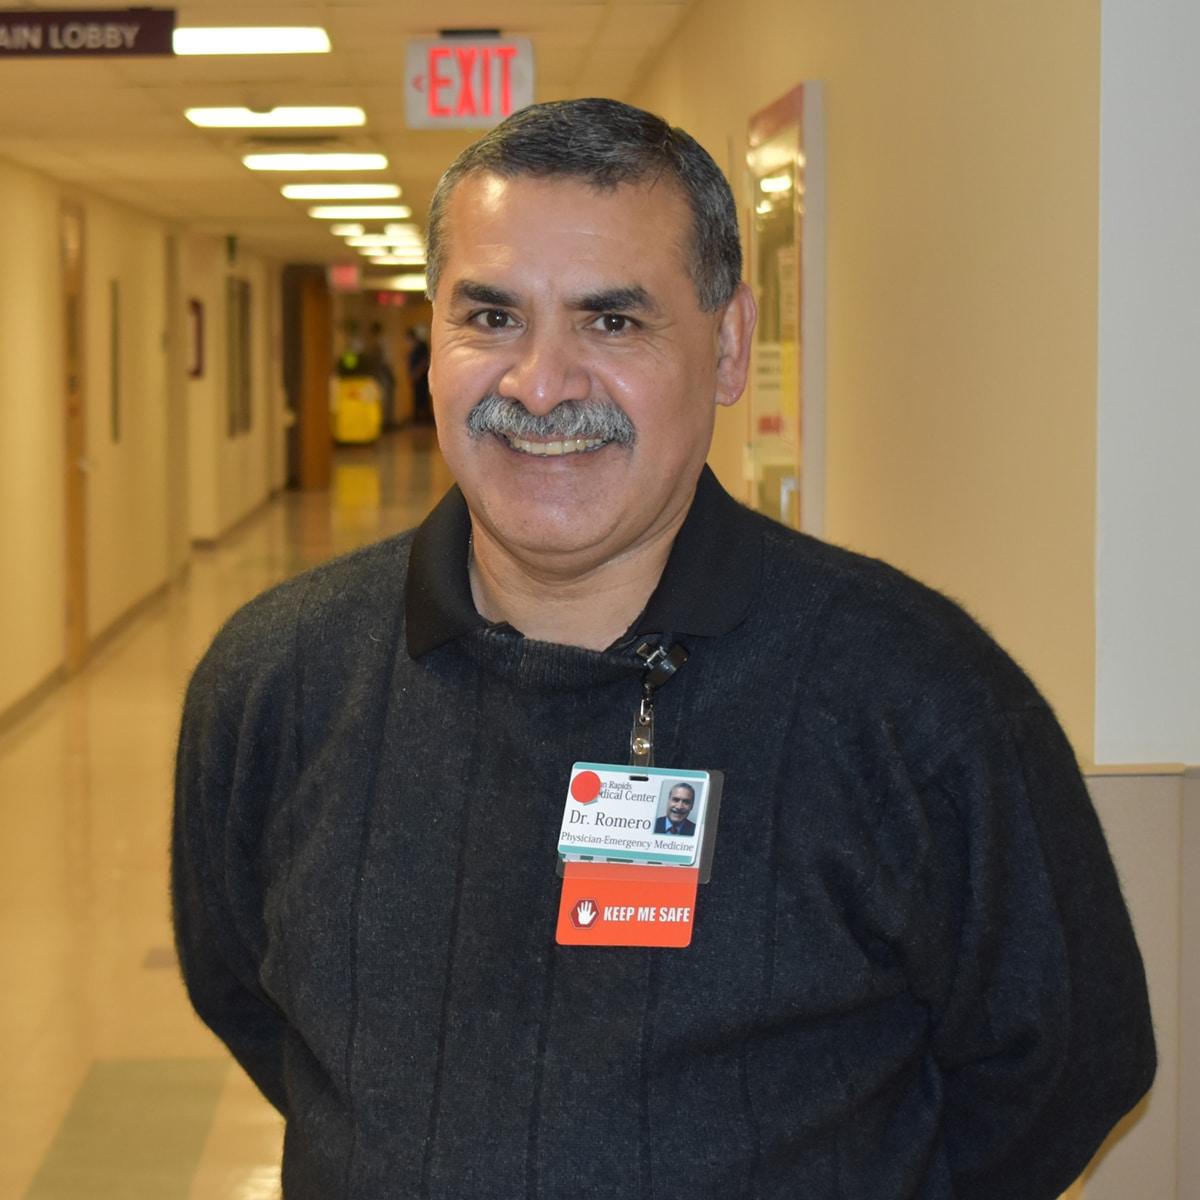 Martin Romero, MD Headshot